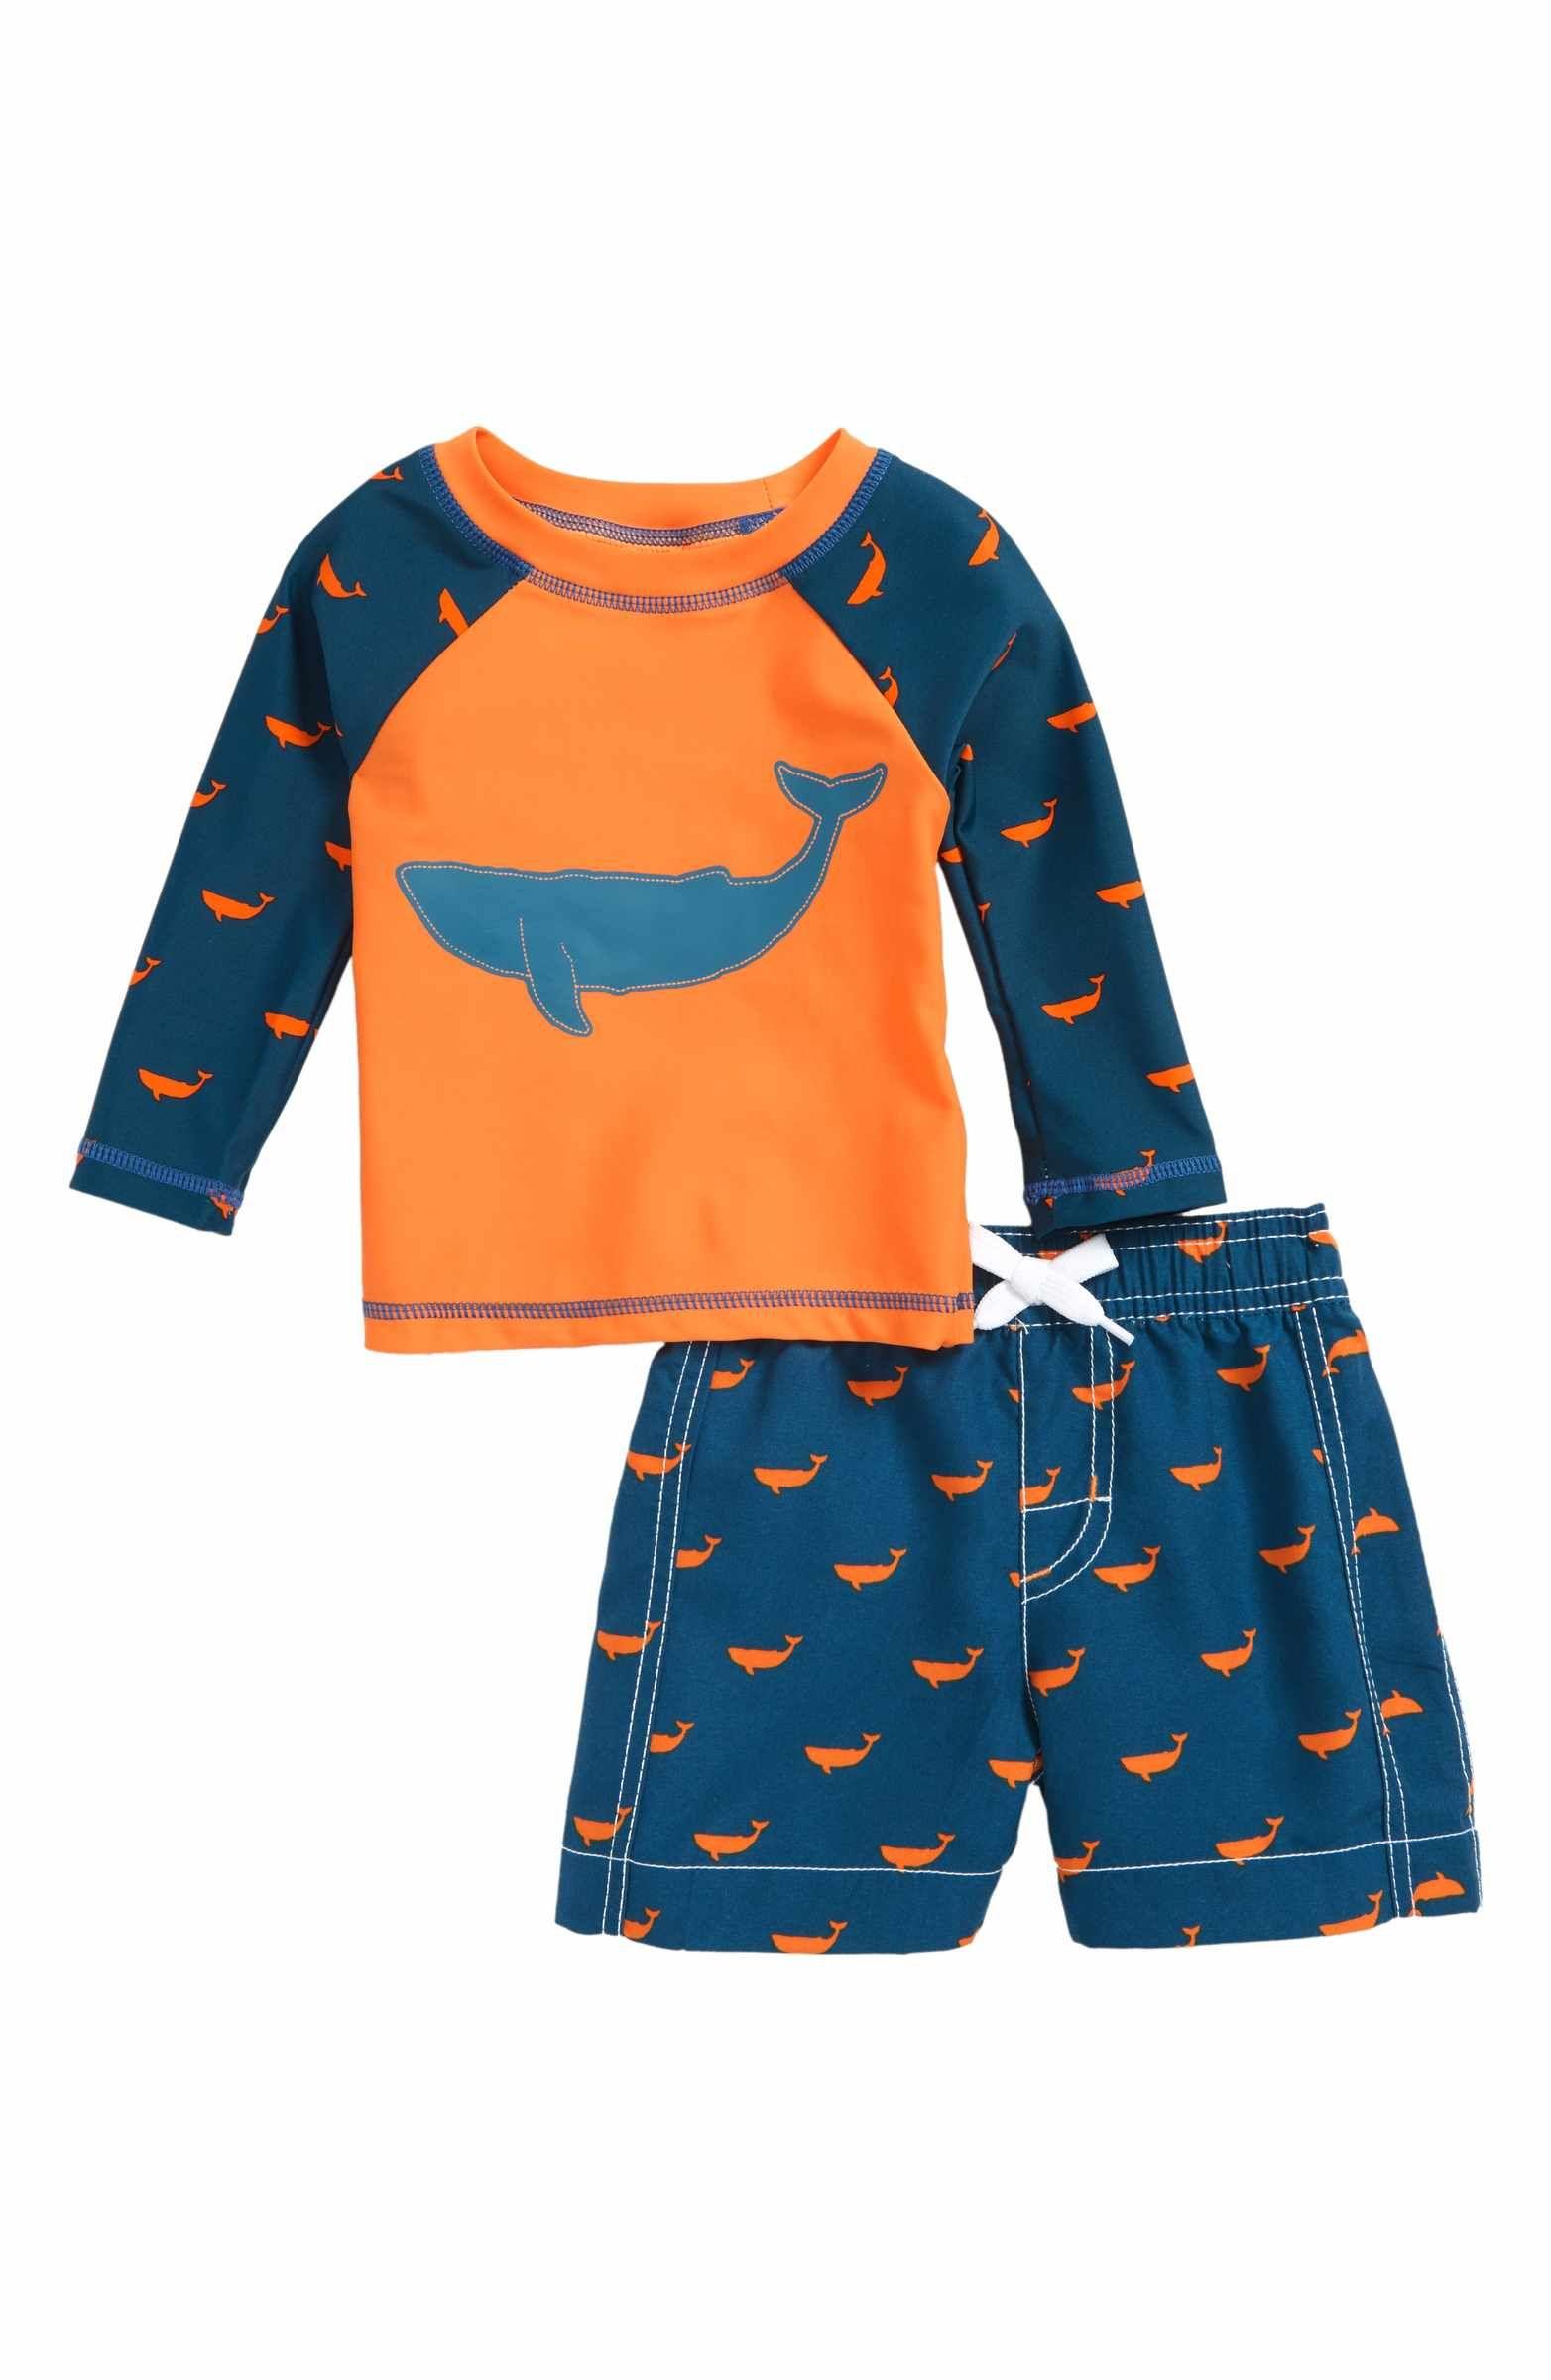 Hatley Baby Boys Rash Guard Swimsuit Sets Swim Shirt